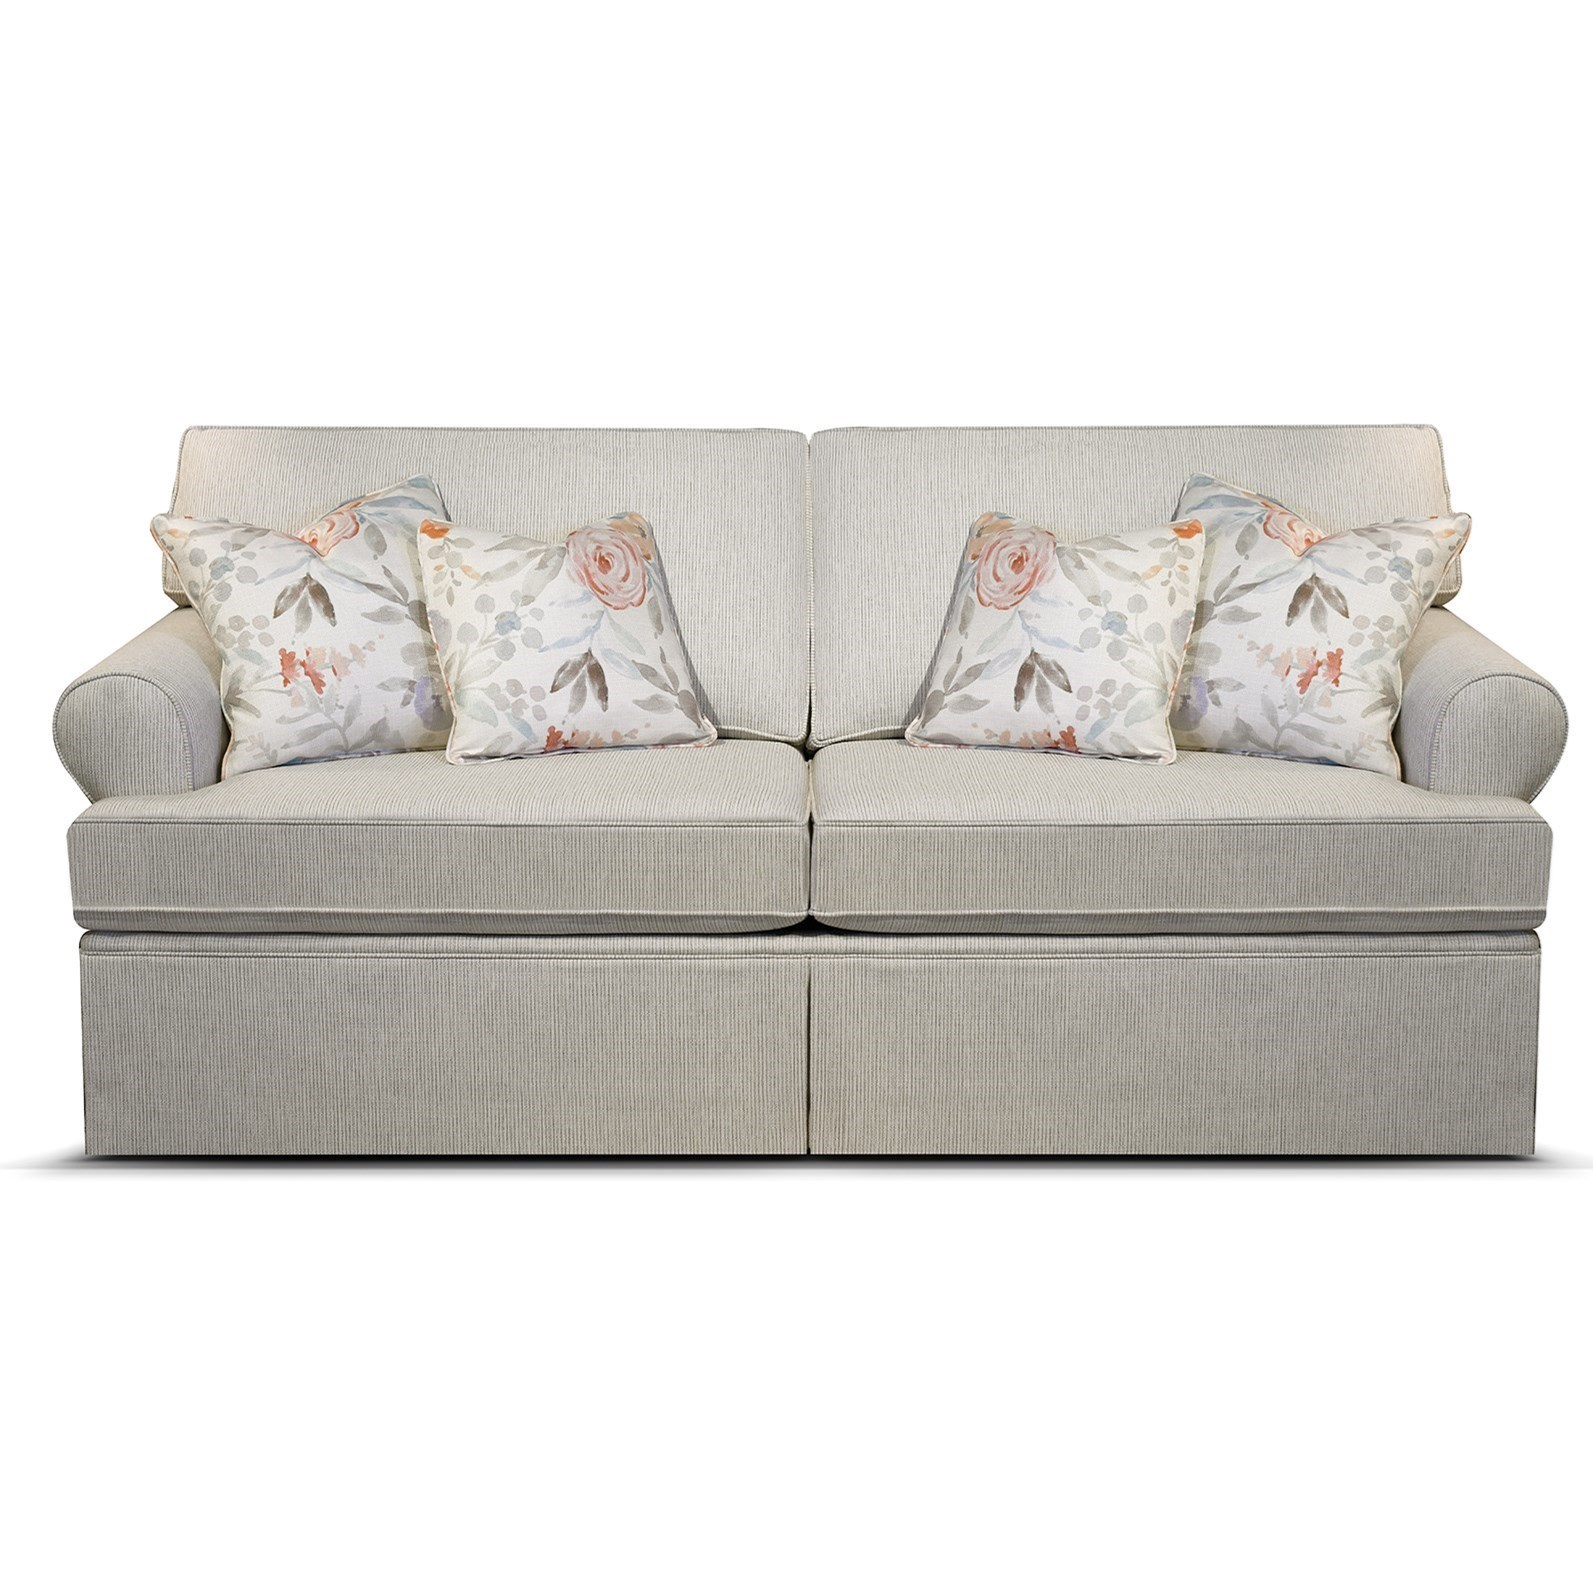 England Isla Traditional Sofa Rune S Furniture Sofas